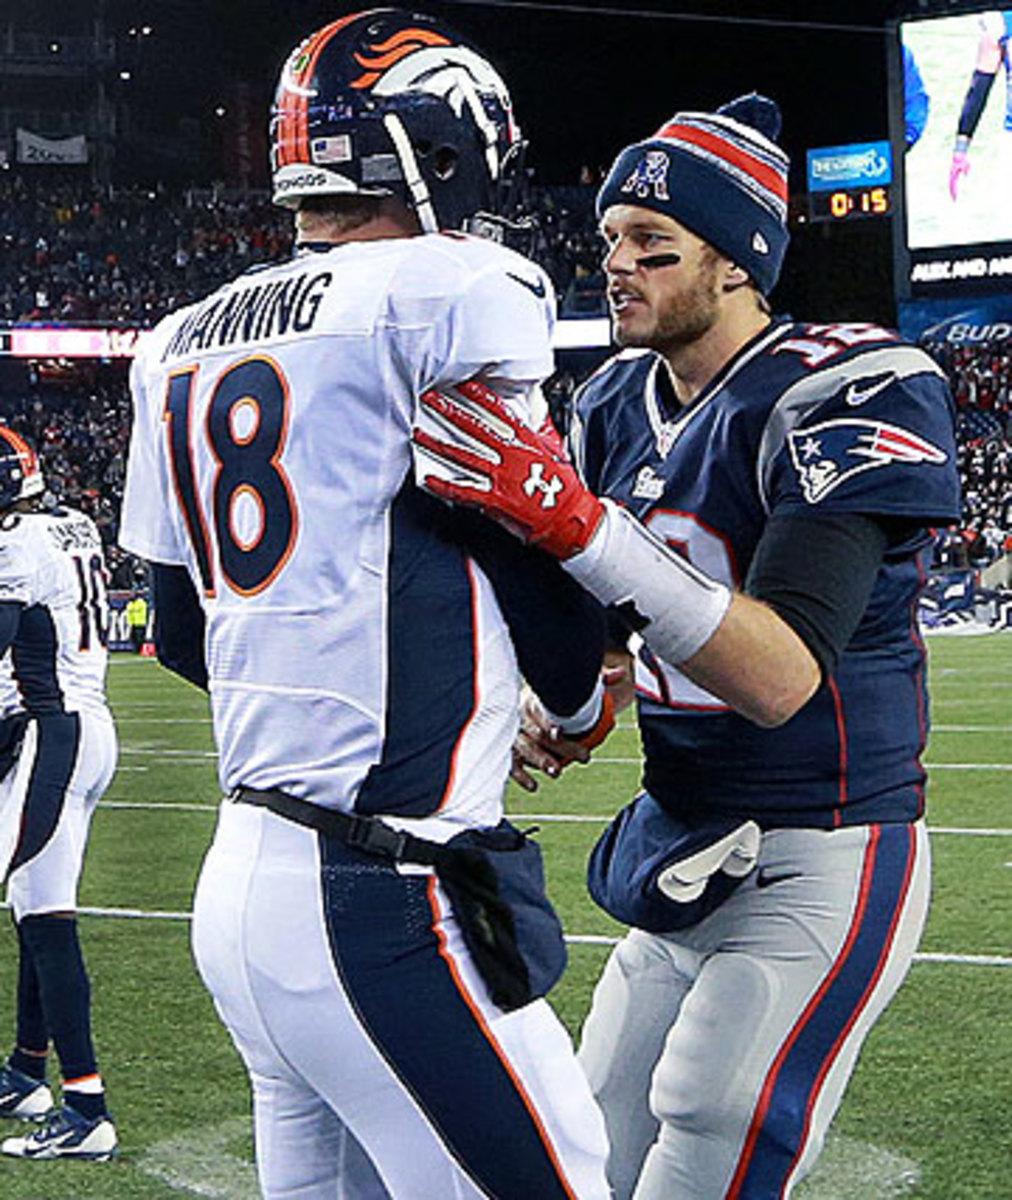 Tom Brady and Peyton Manning will meet again in 2015 since their teams each won their divisions this season. (Jim Davis/Getty Images)